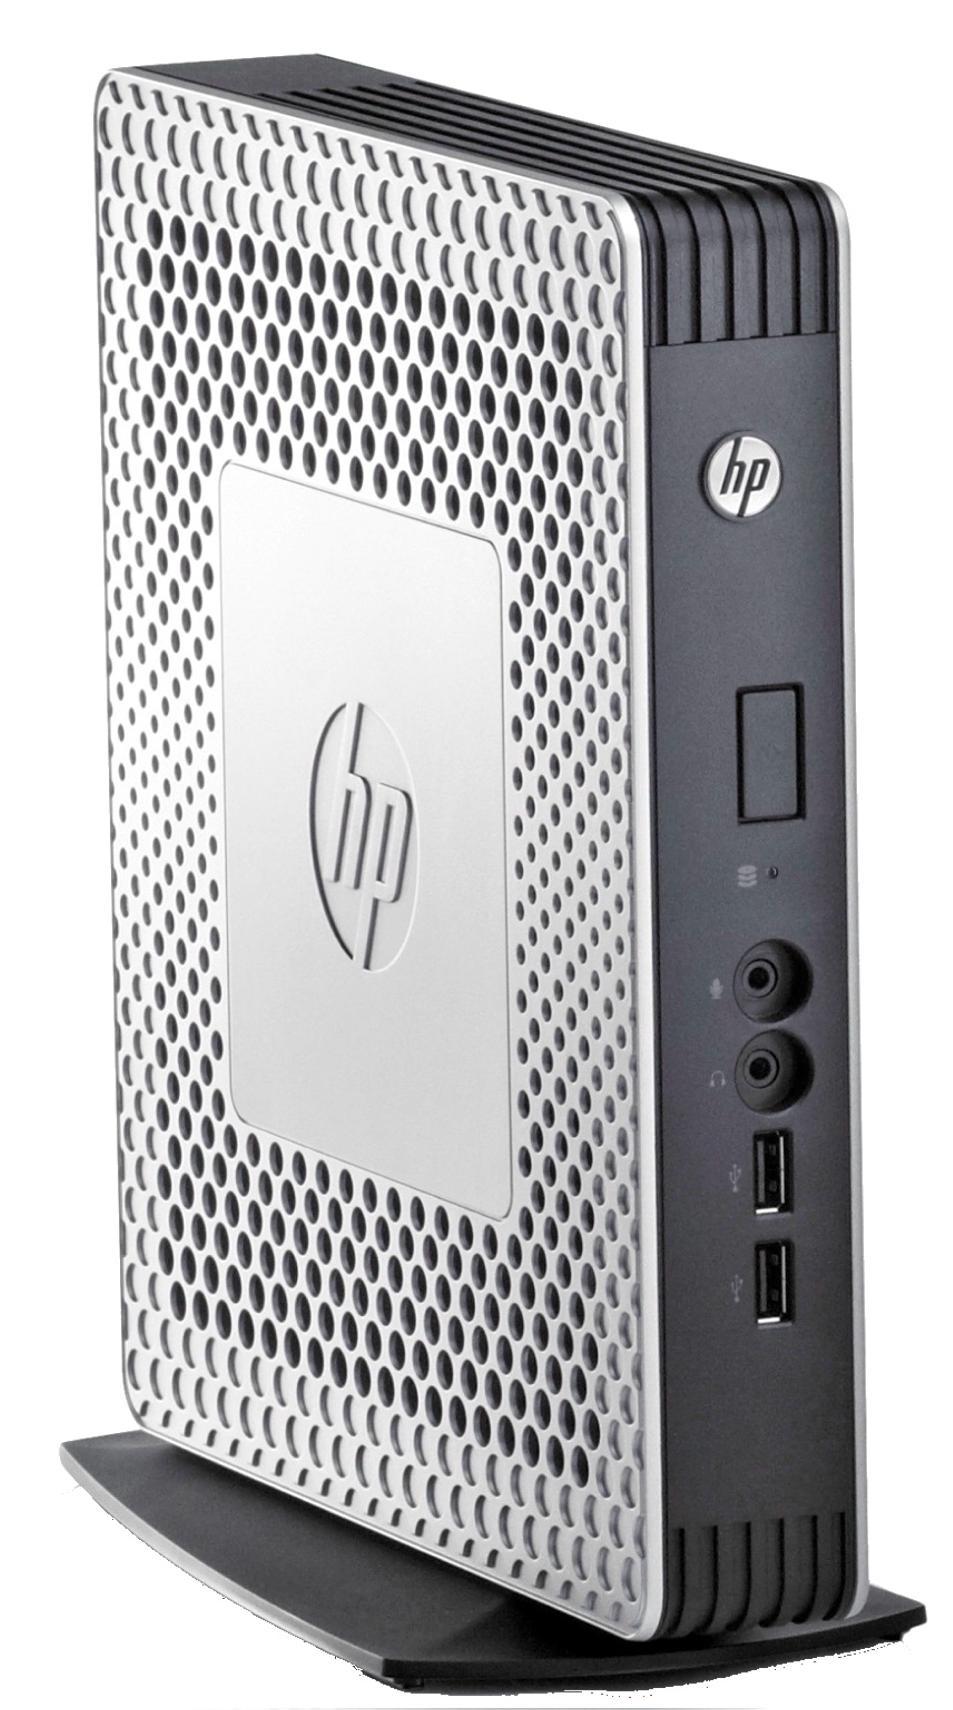 HP t610 Flexible Thin Client Dual Core (T56N) 1.65GHz 2GB RAM 4GB Flash LAN Windows 7 Standard Embedded (Radeon HD 6320)